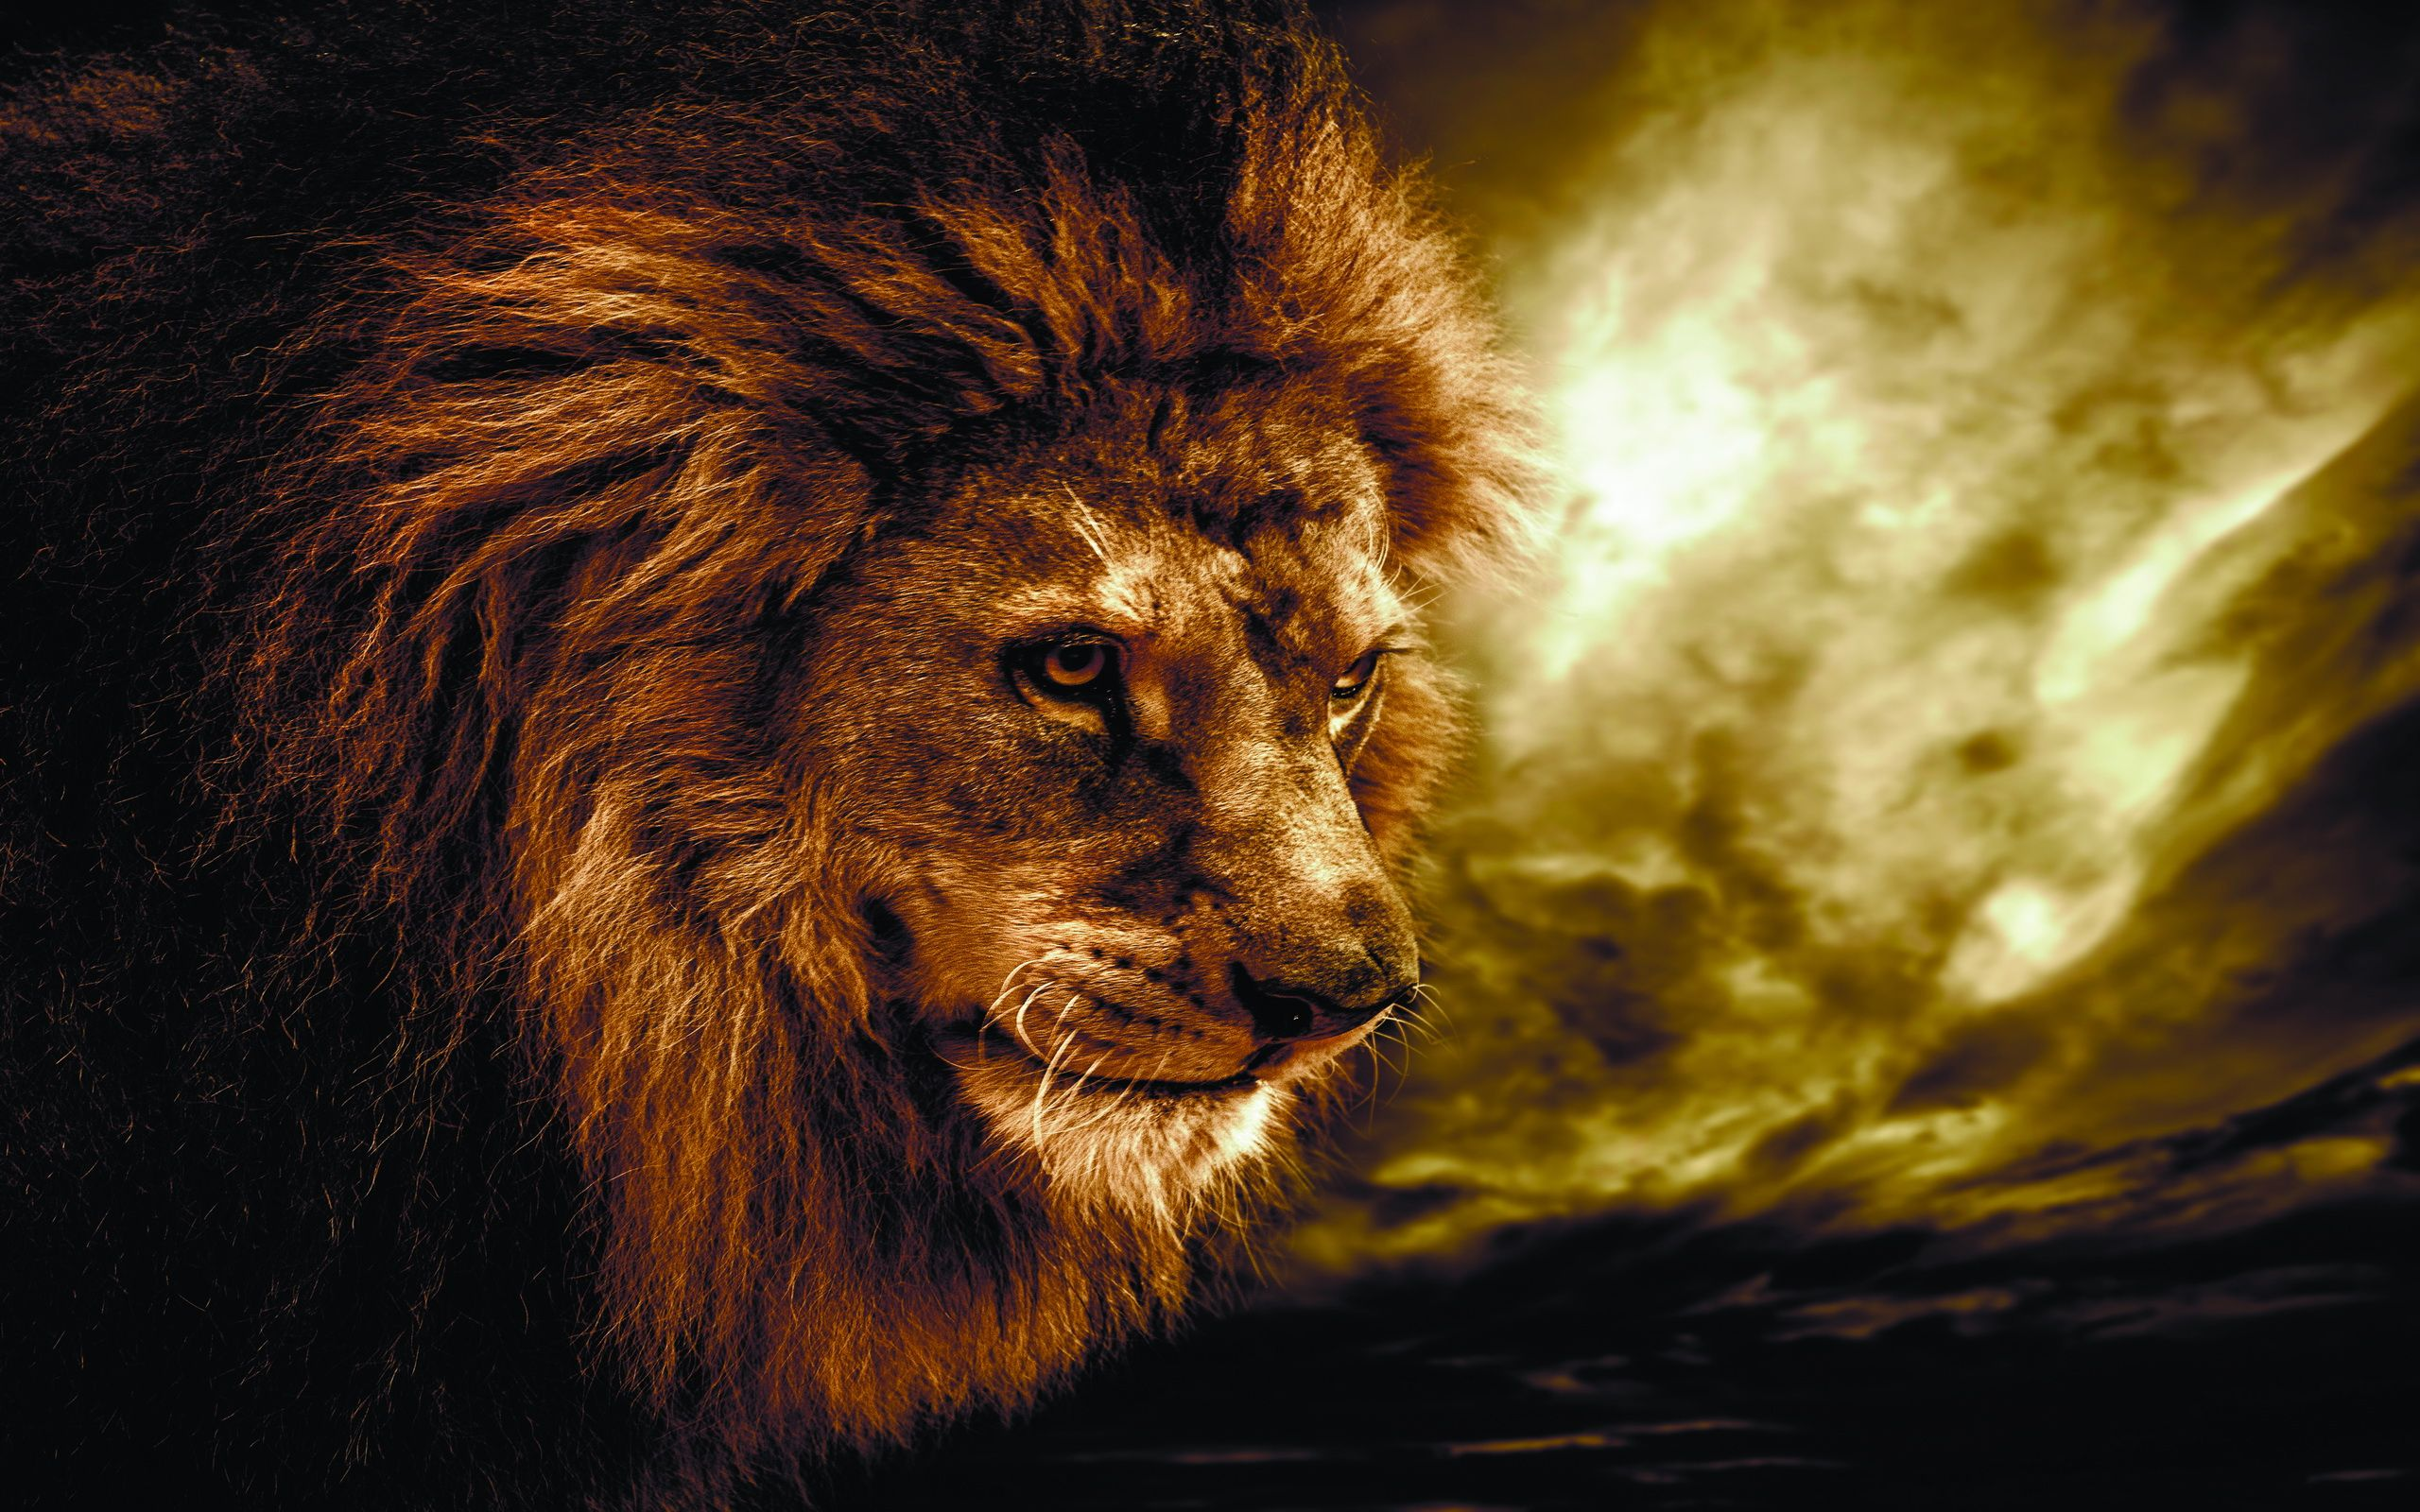 Hd wallpaper lion - Lion Hd Wallpapers Download